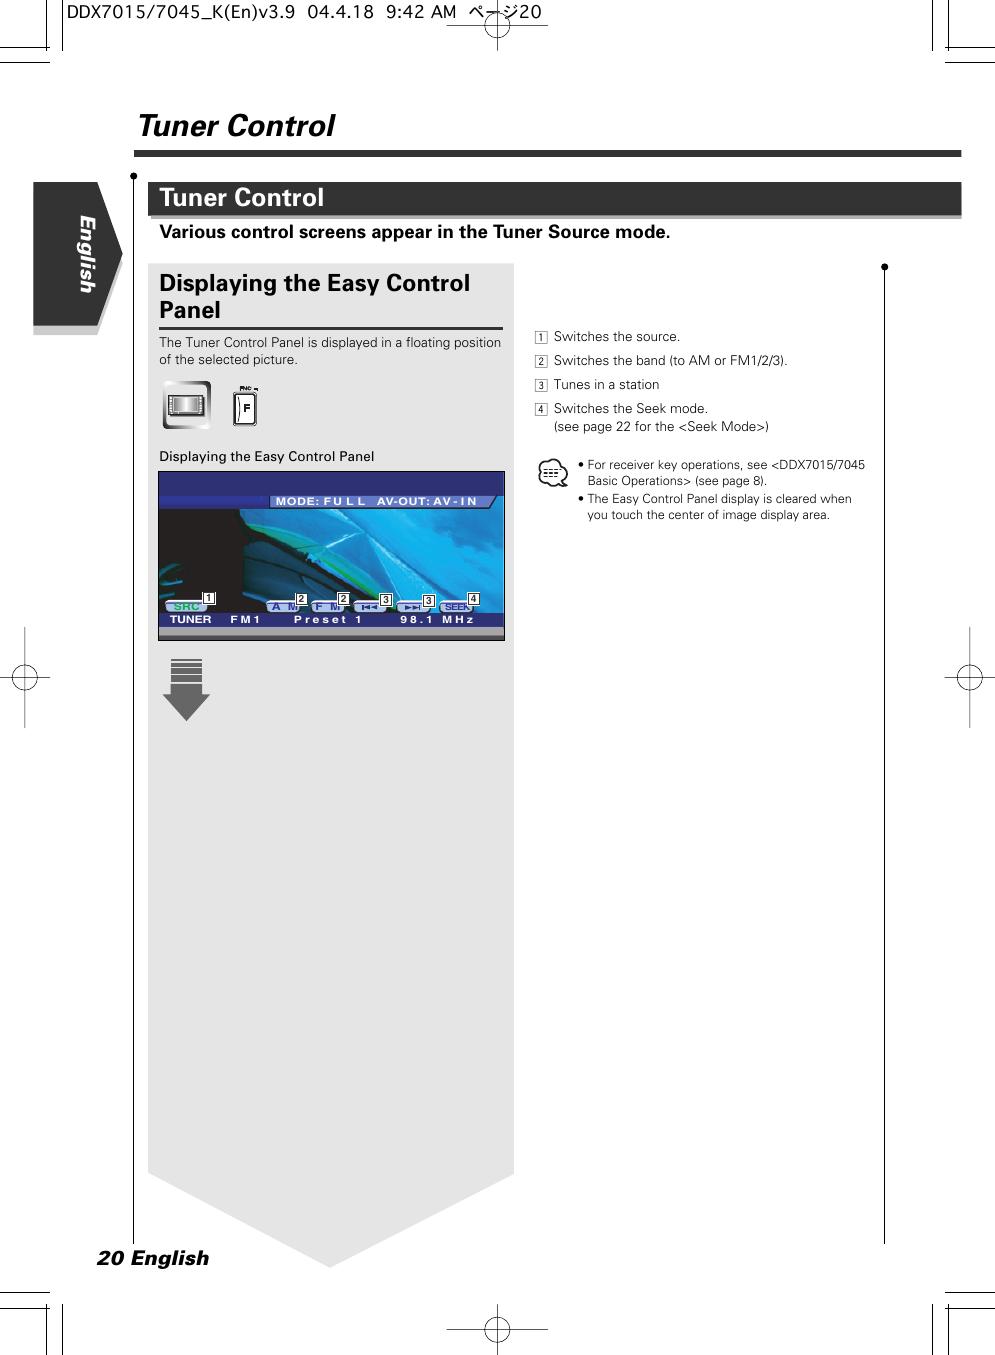 Kenwood Excelon Ddx7015 Users Manual DDX7015_7045 (Revised) on